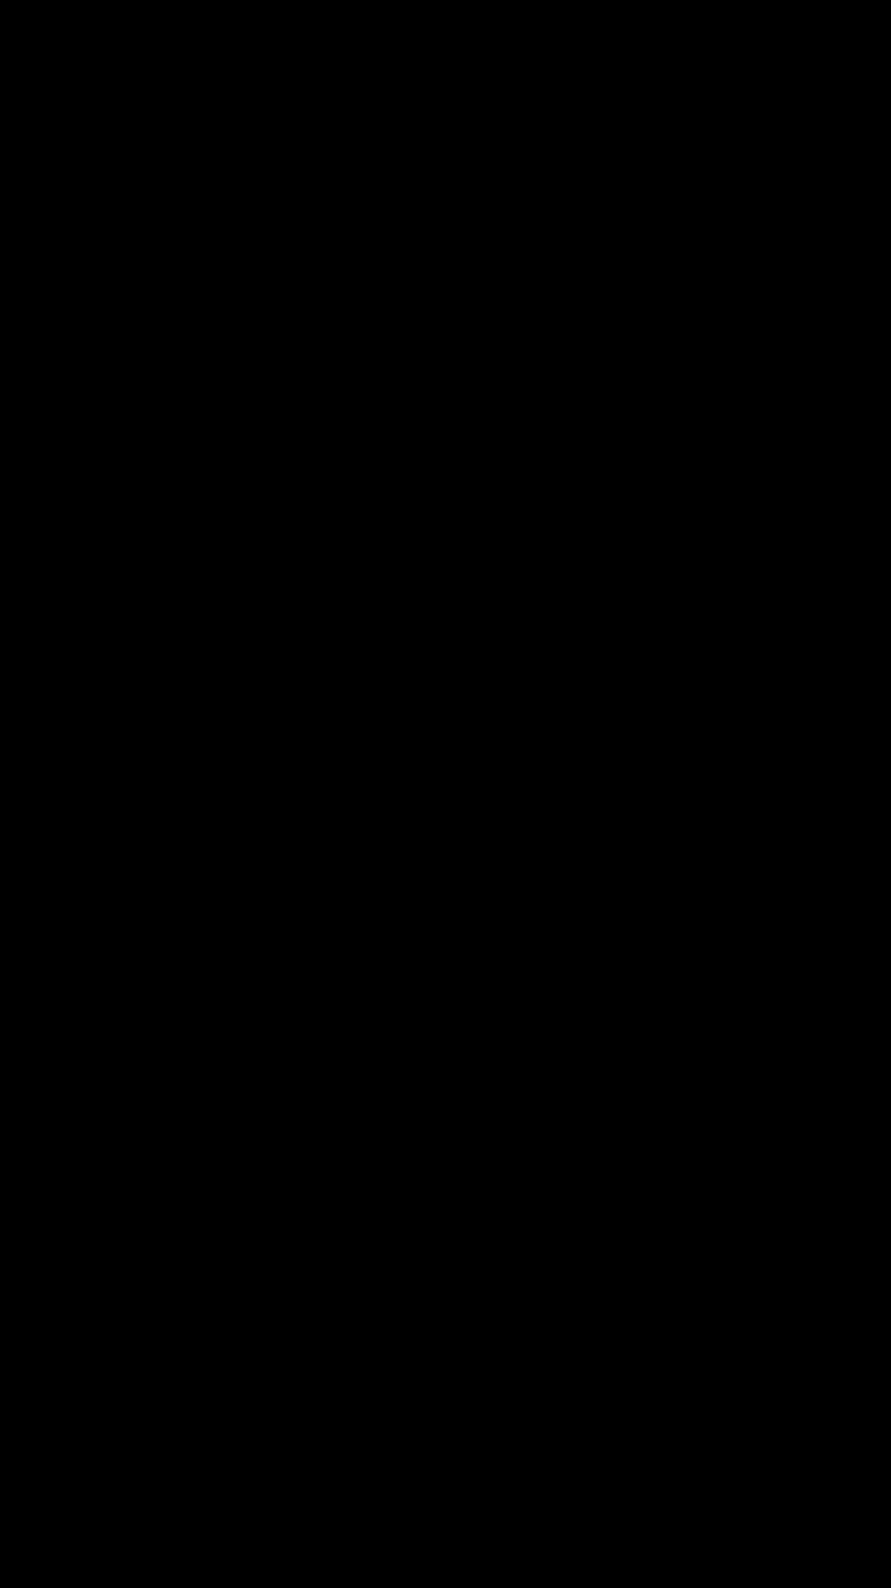 Rolls Royce manufacturer logo